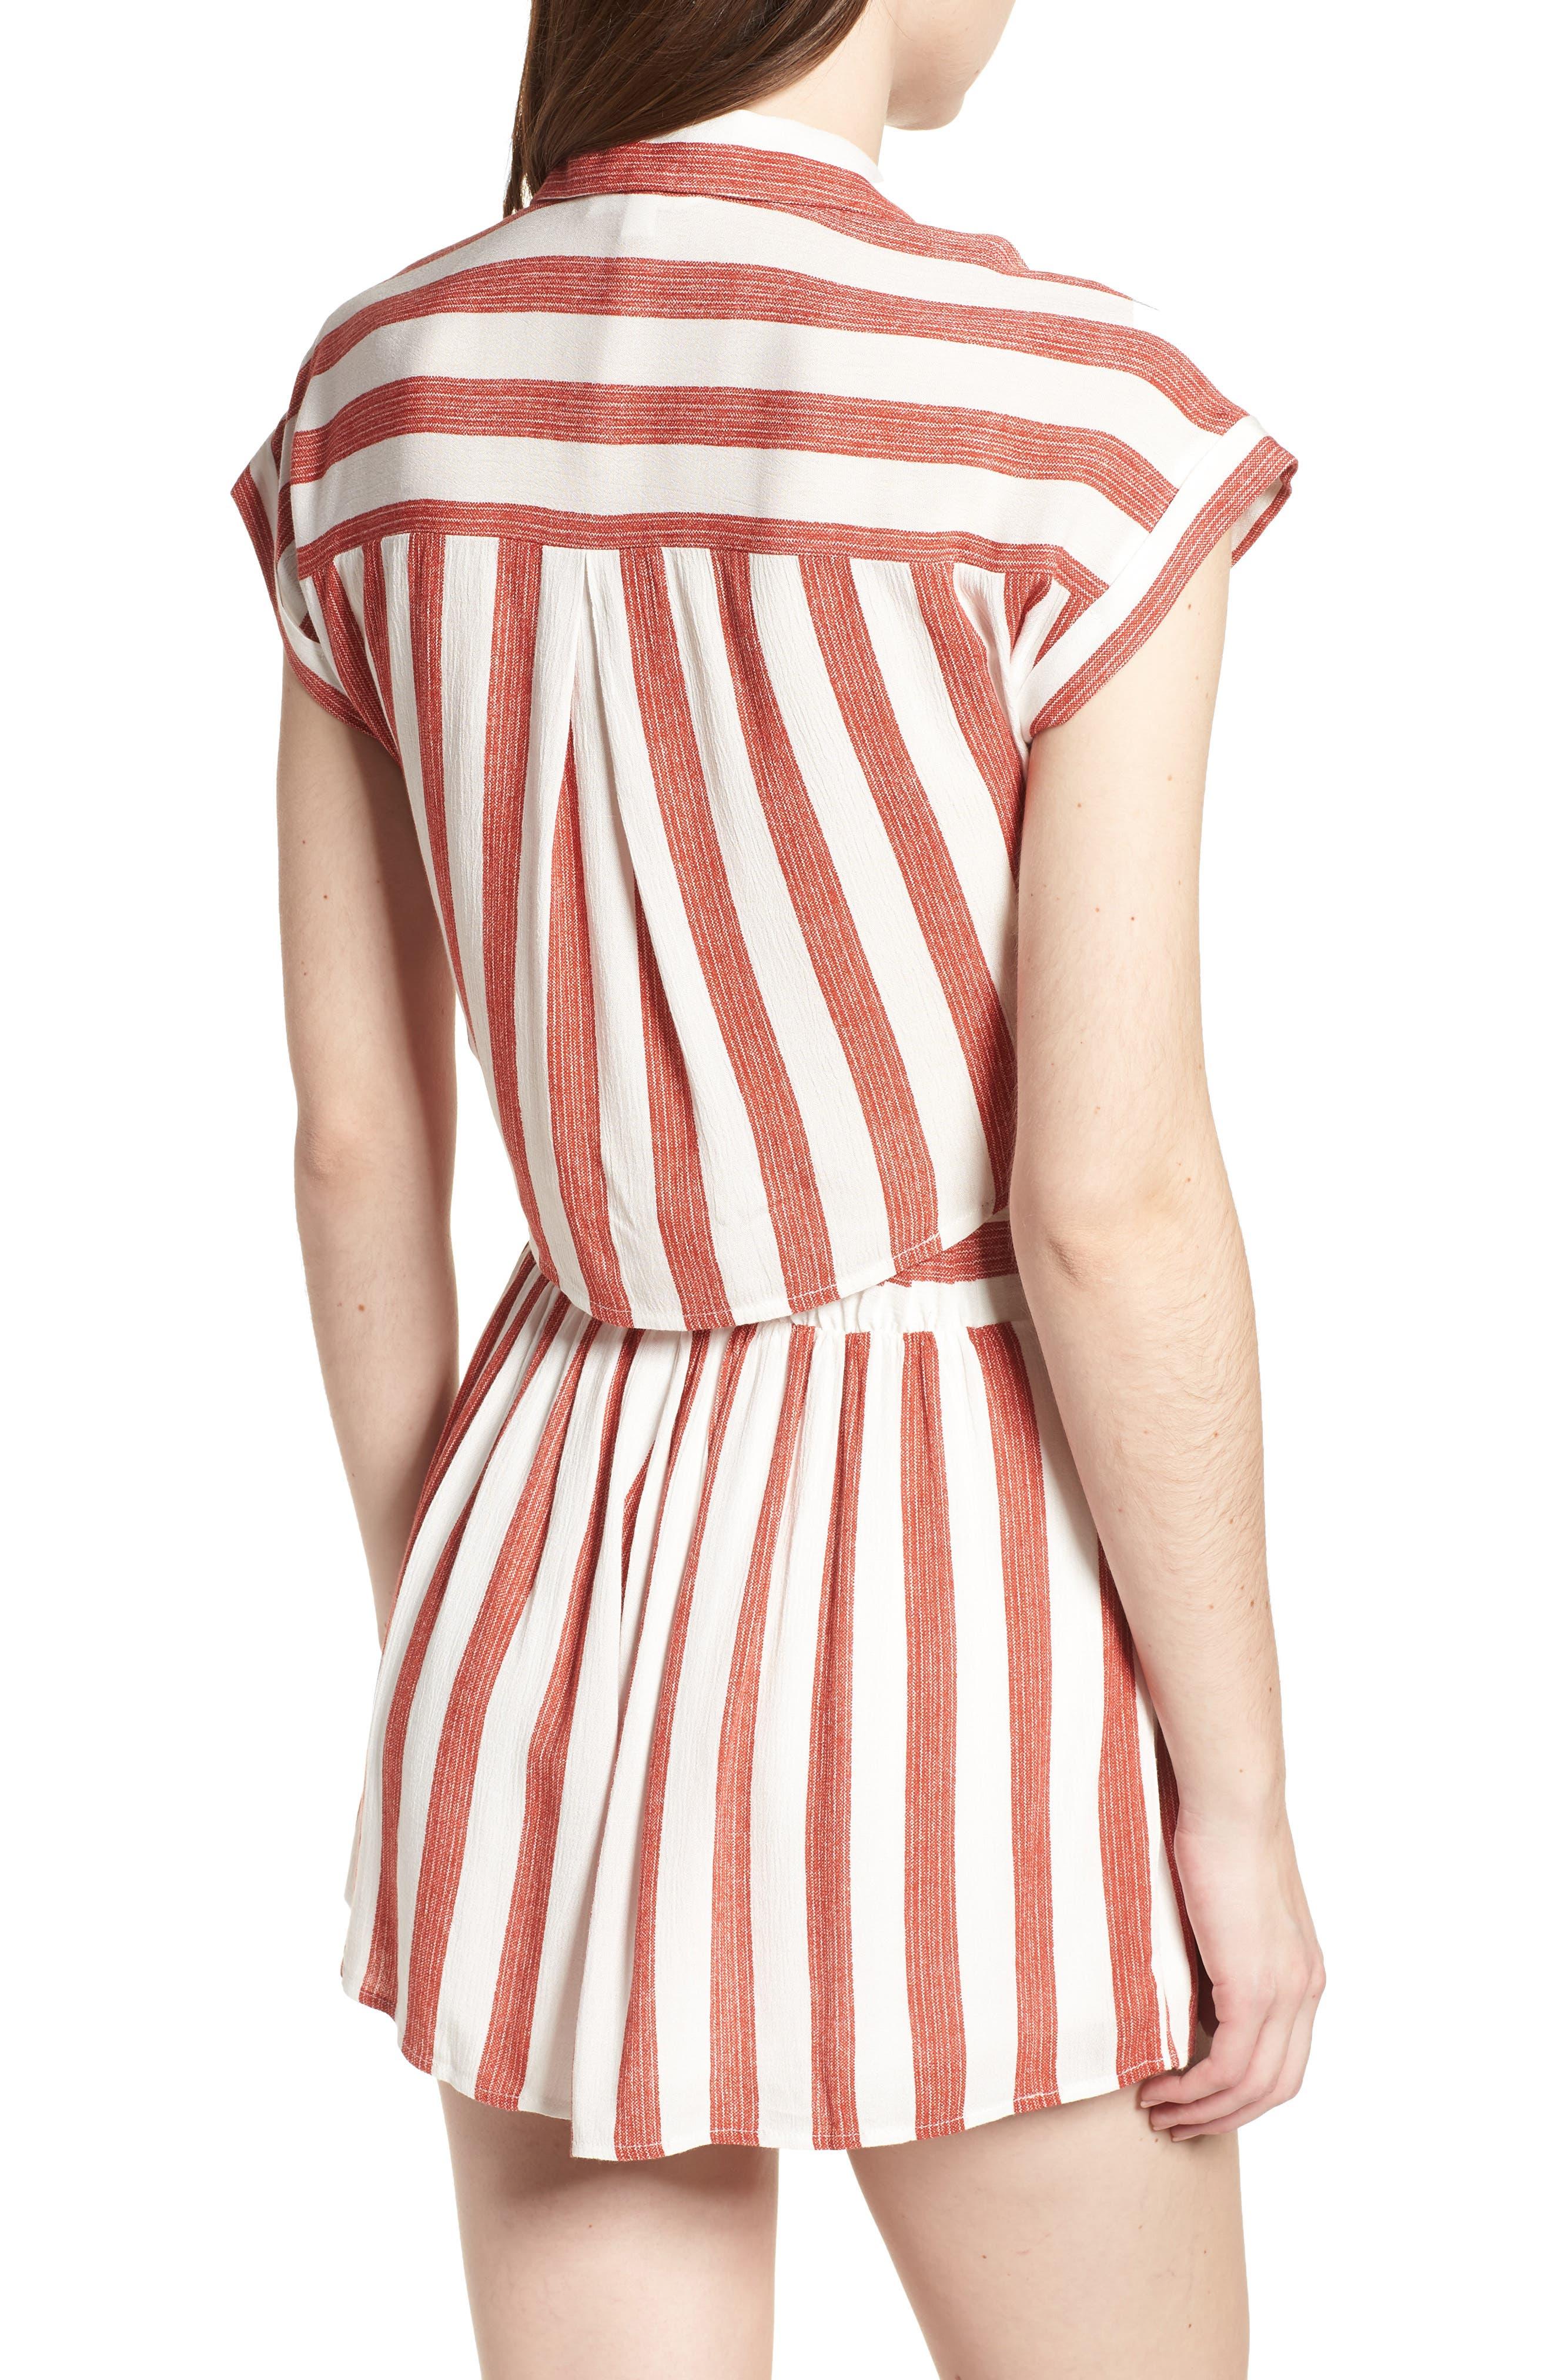 LYDELLE,                             Stripe Tie Front Top,                             Alternate thumbnail 2, color,                             600